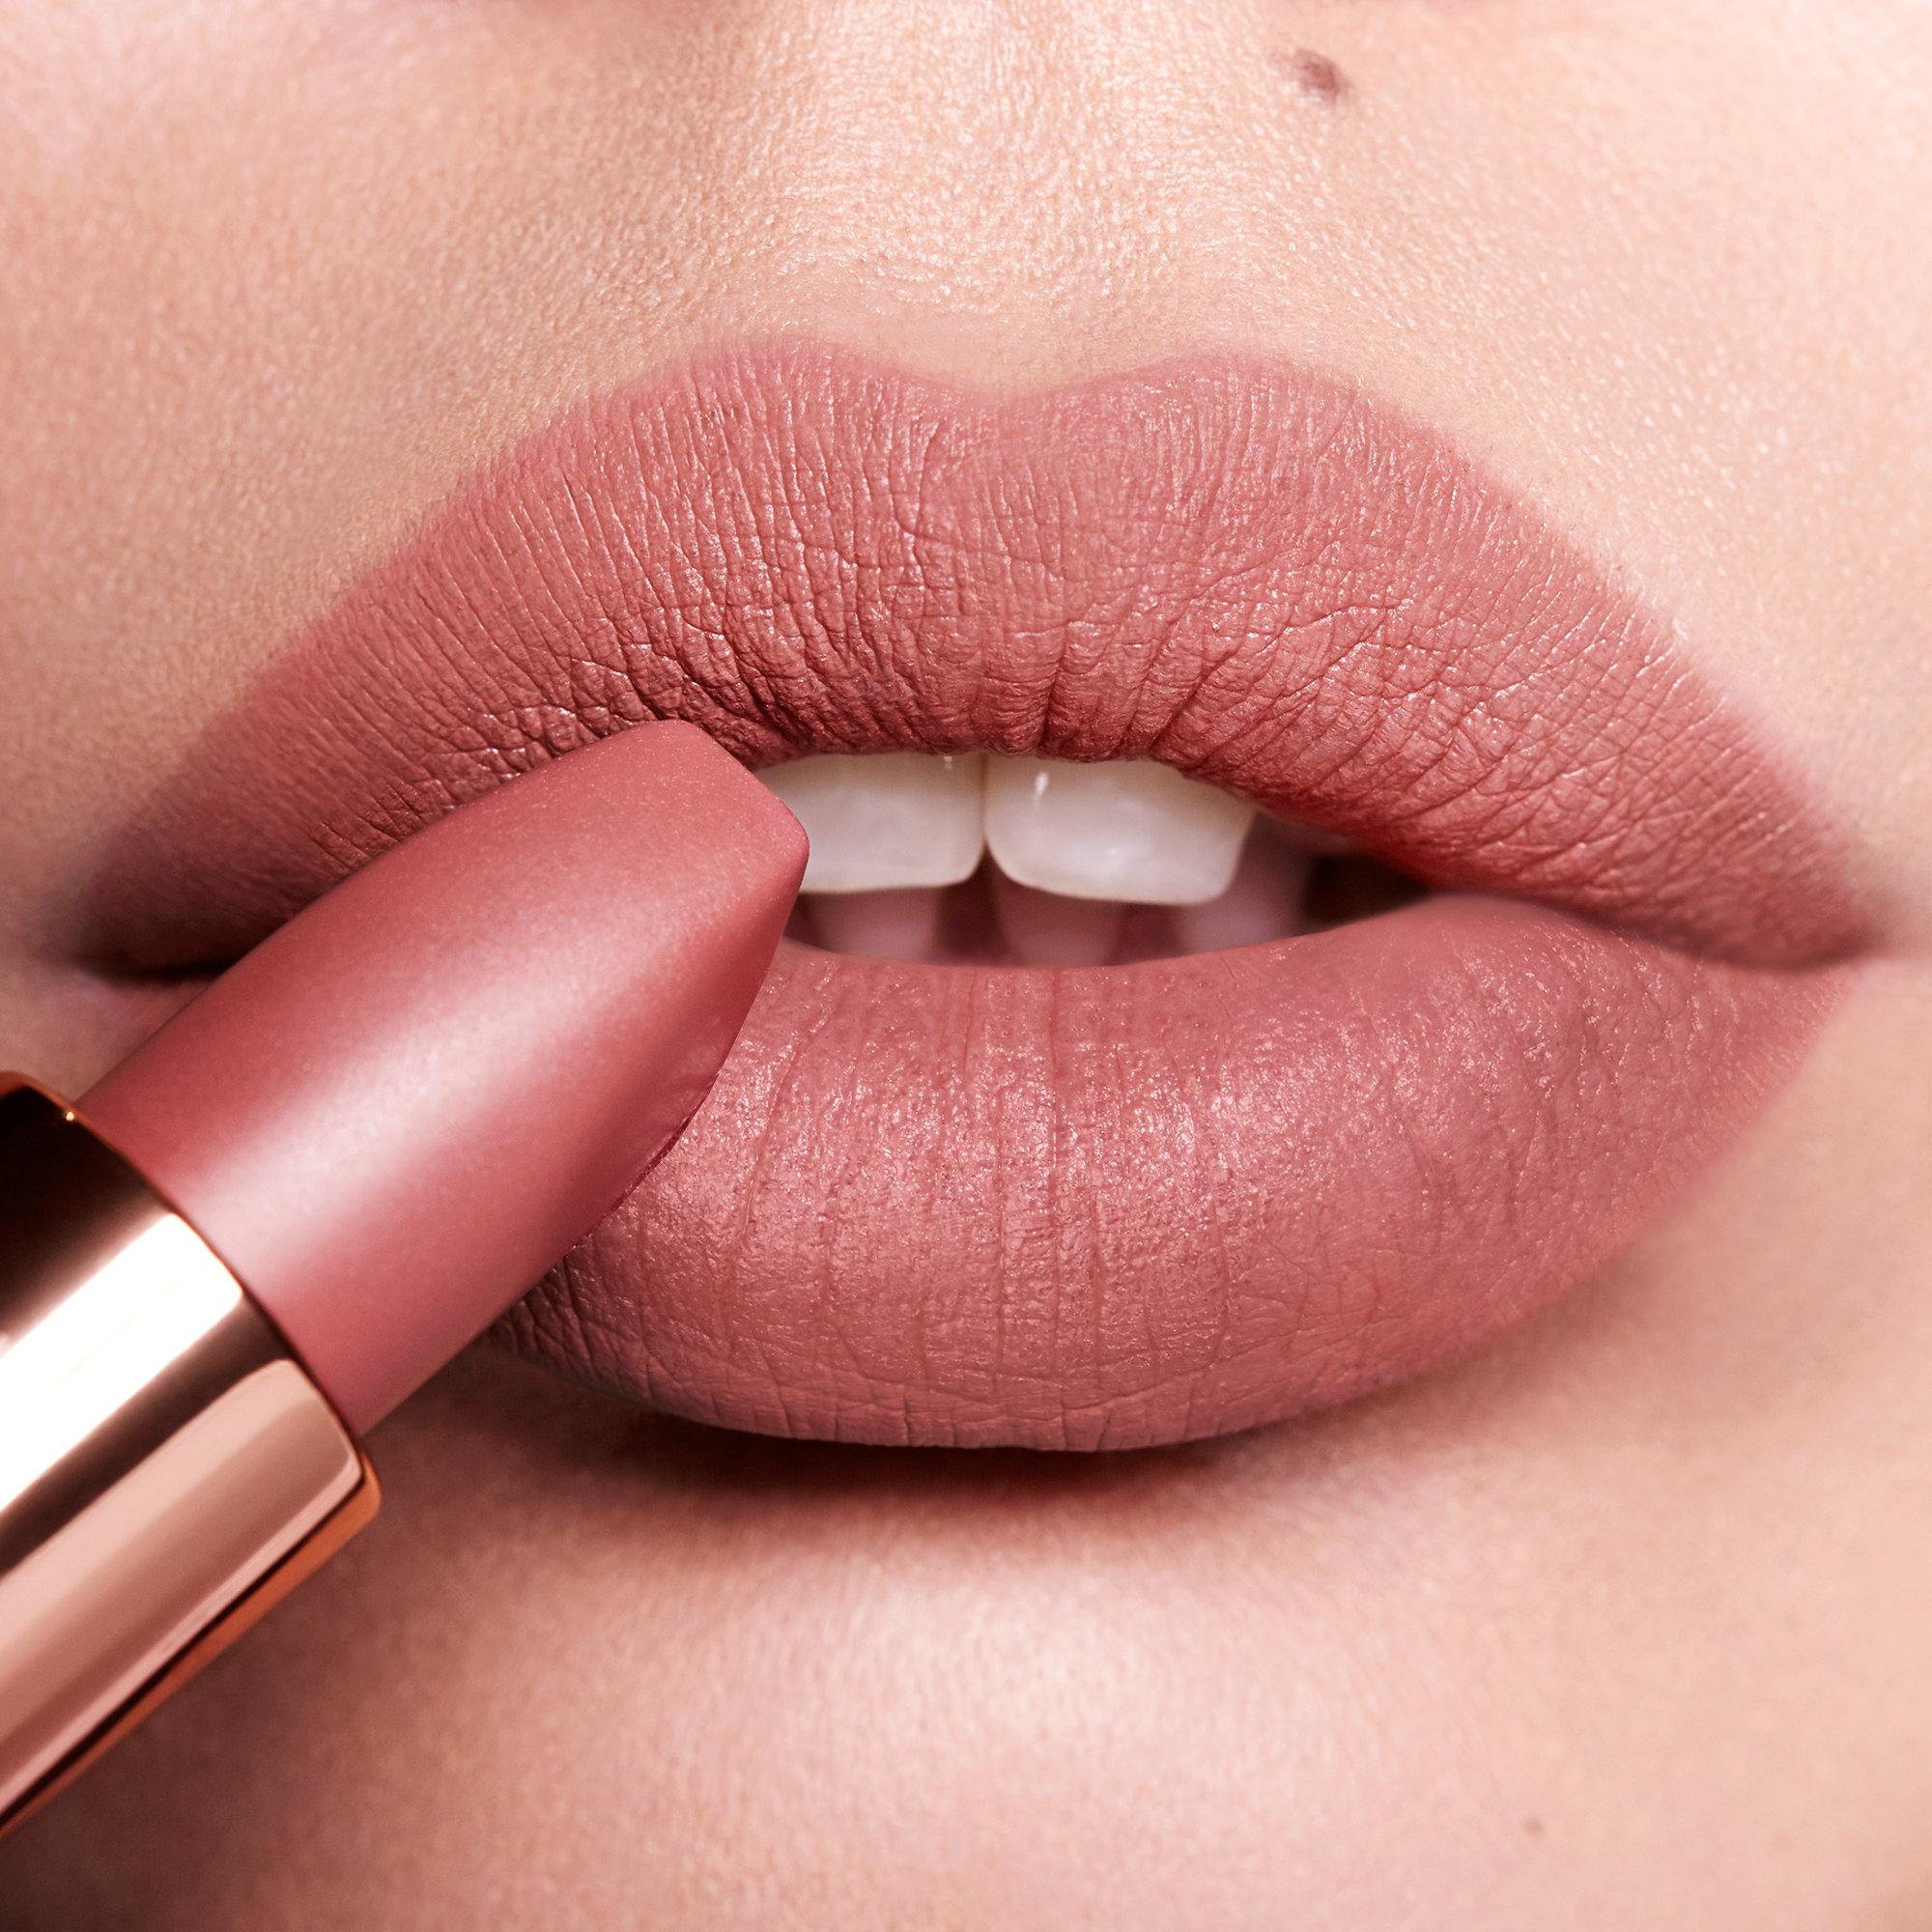 Charlotte Tilbury Matte Revolution Lipstick in Pillow Talk (Image via Sephora)